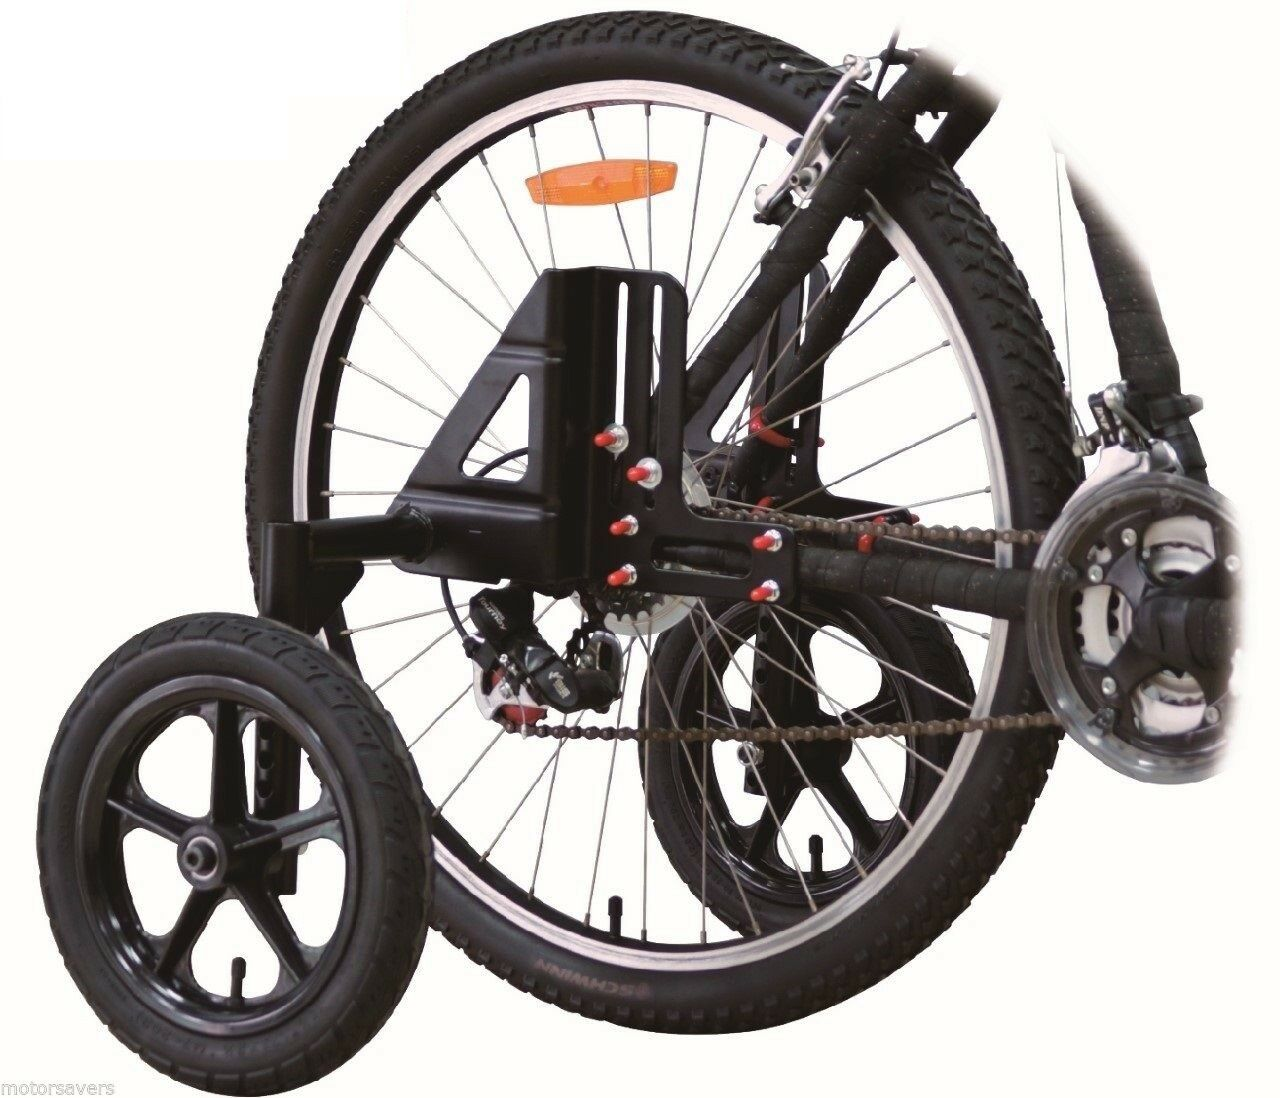 Adult Bike all Stabilisers Mobility Training Wheels - Fits all Bike Wheel Größes df85b5